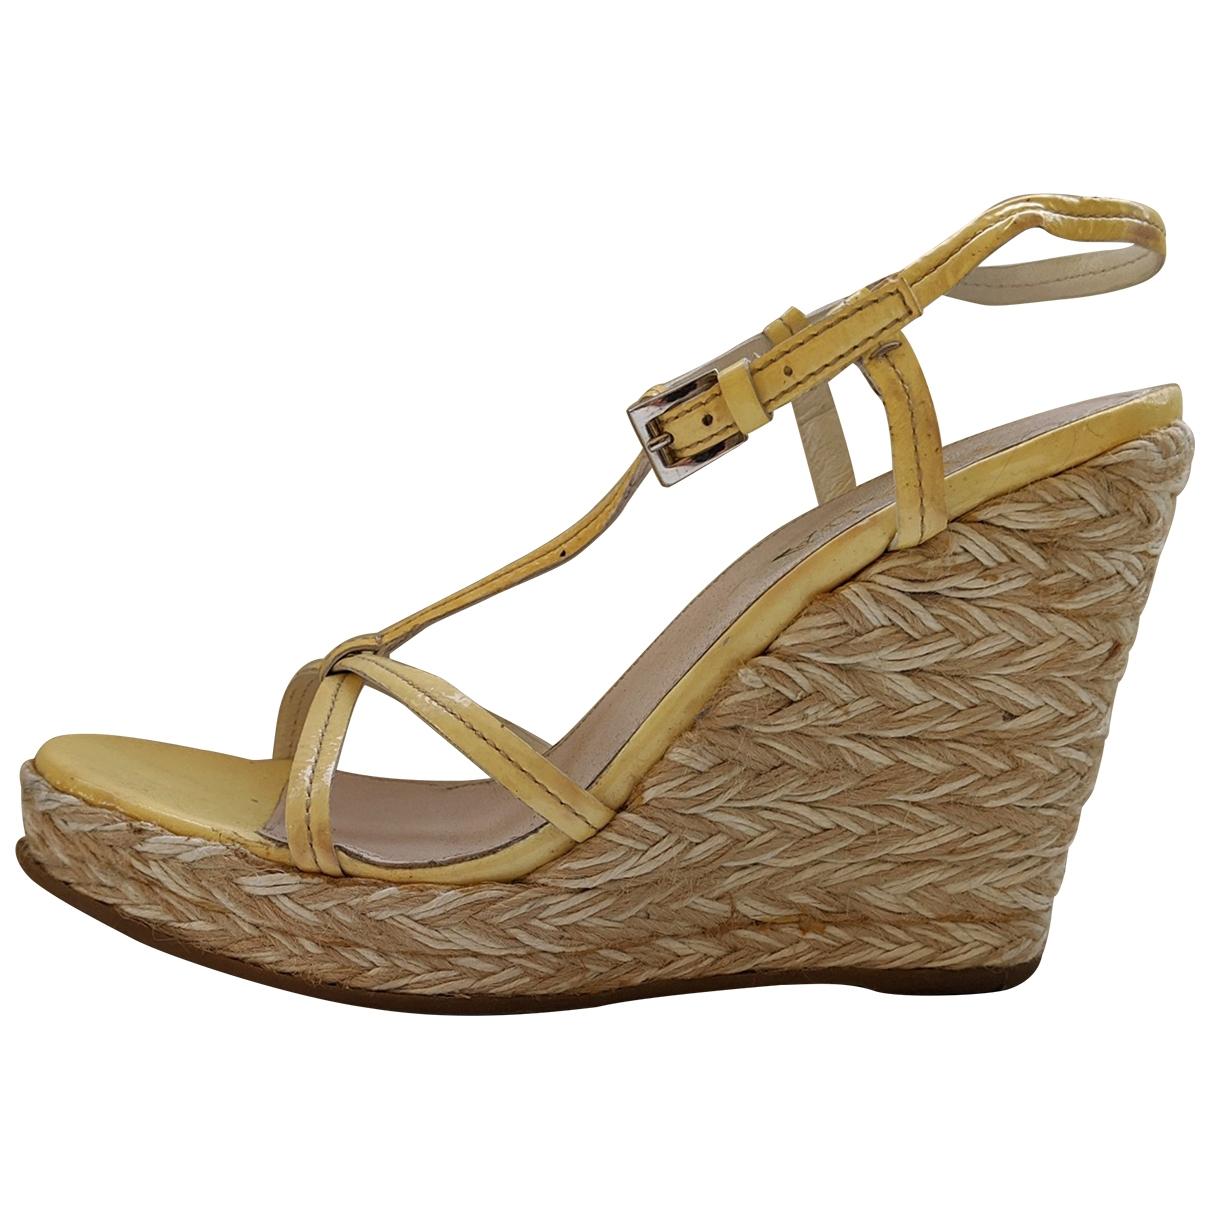 Prada - Sandales   pour femme en cuir verni - jaune